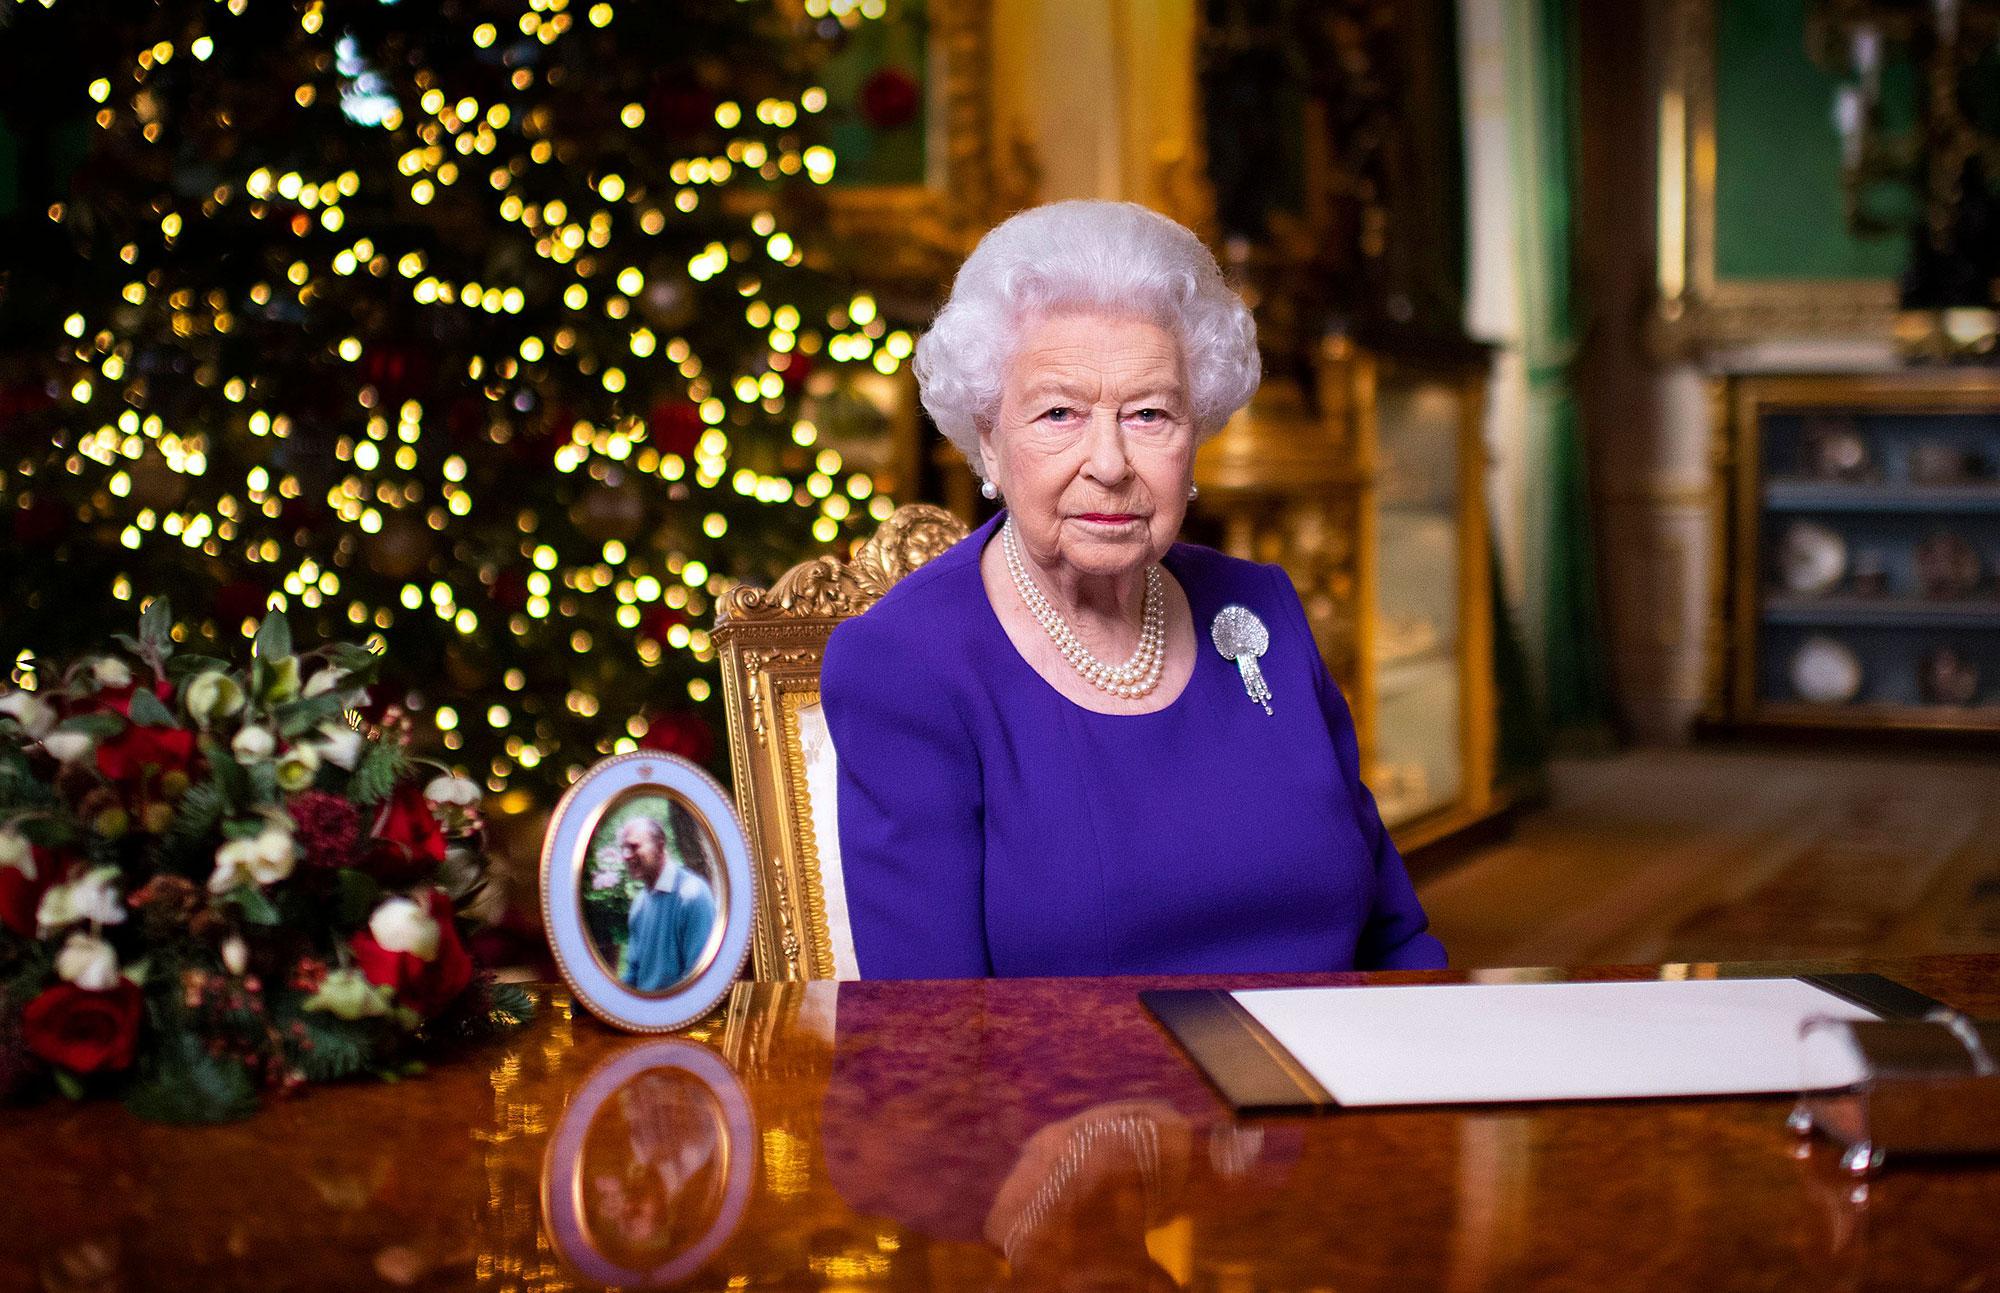 Queen Elizabeth Delivers Hopeful Christmas Speech in Purple Gown